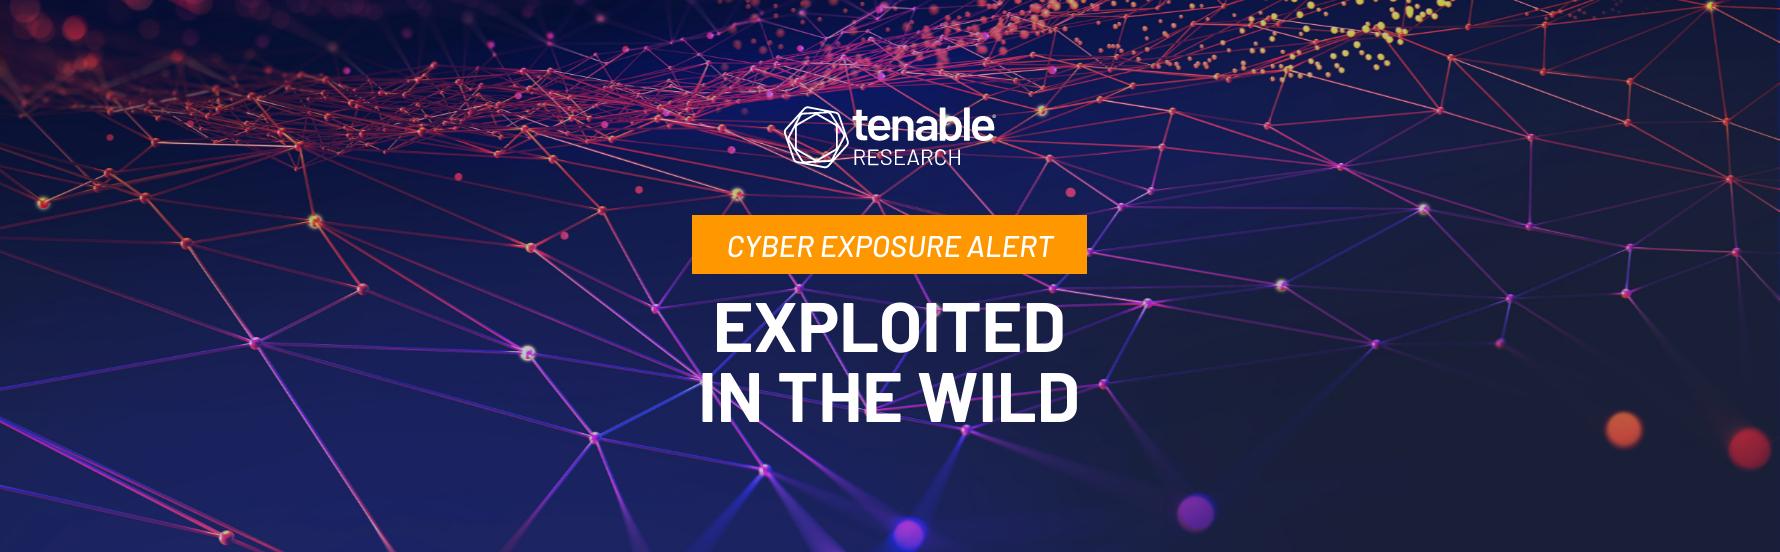 CVE-2021-41773: Path Traversal Zero-Day in Apache HTTP Server Exploited